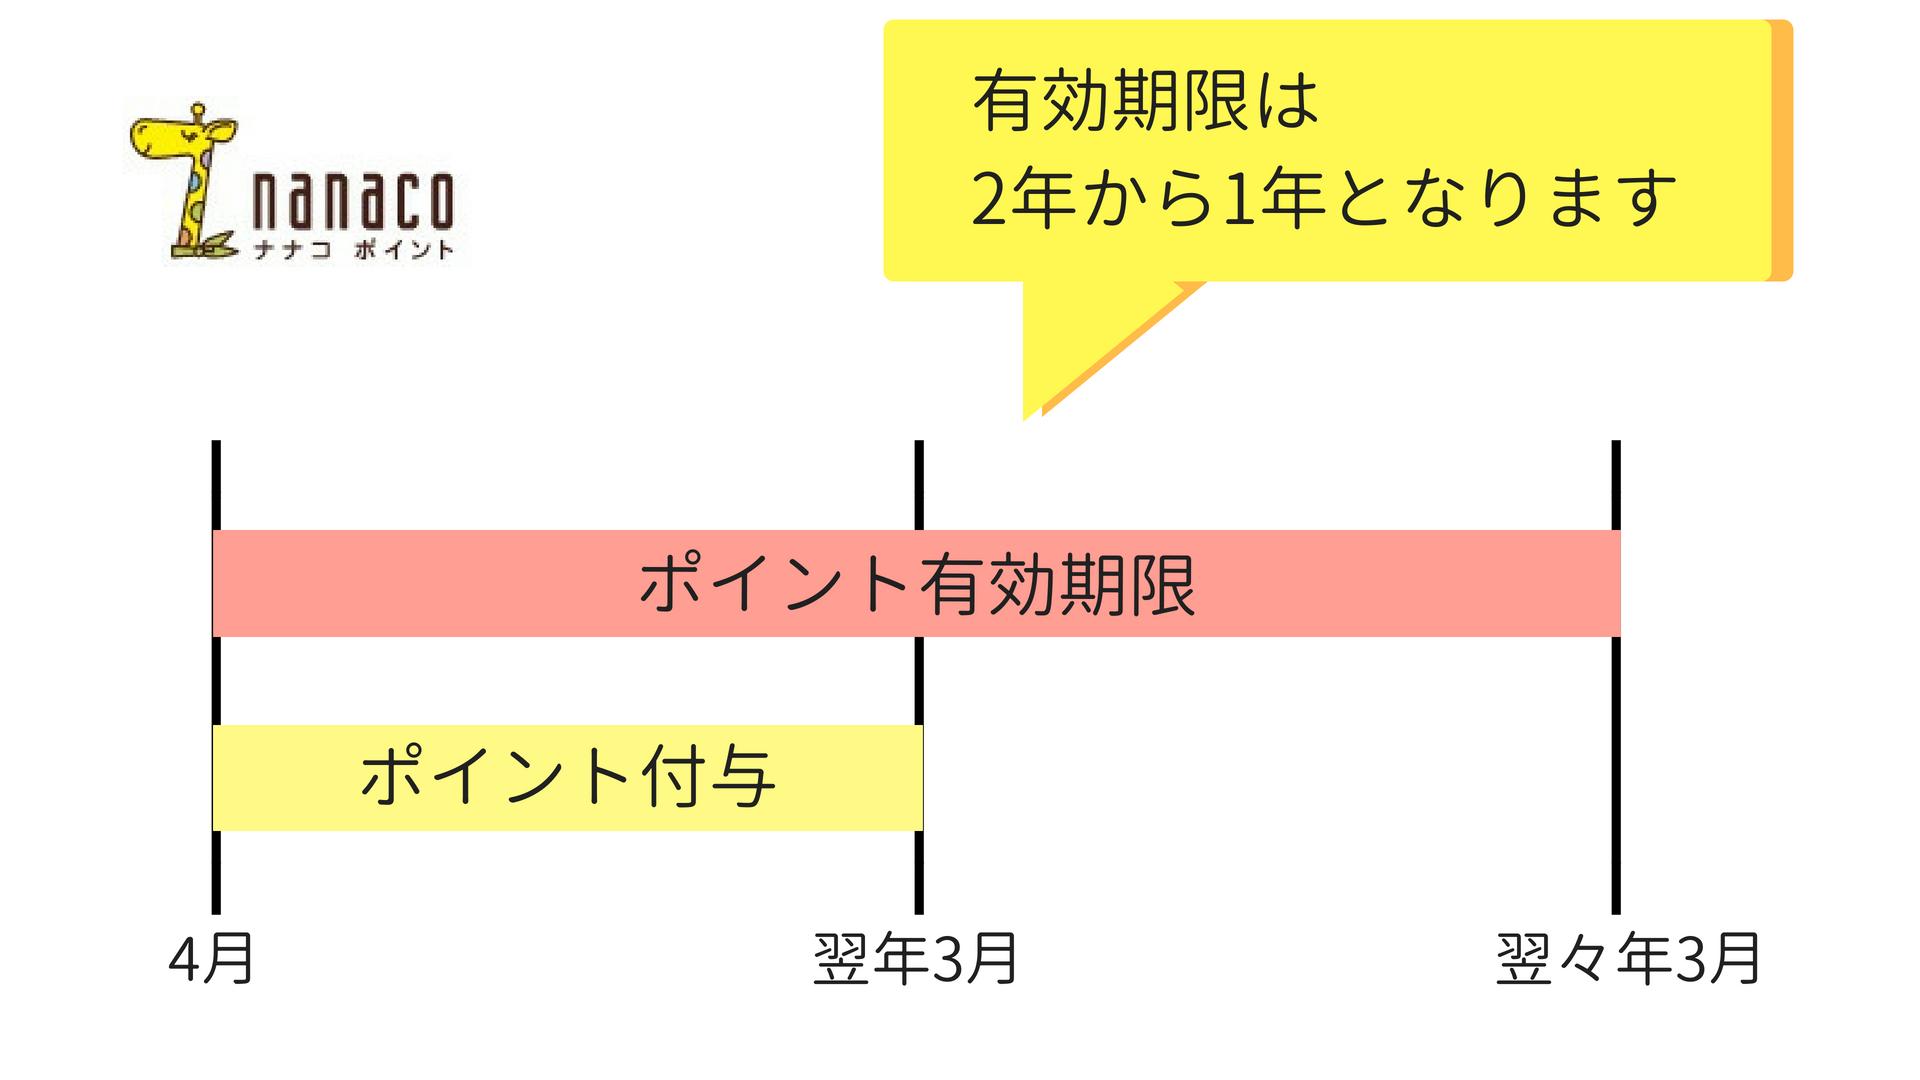 nanacoポイントの有効期限イメージ